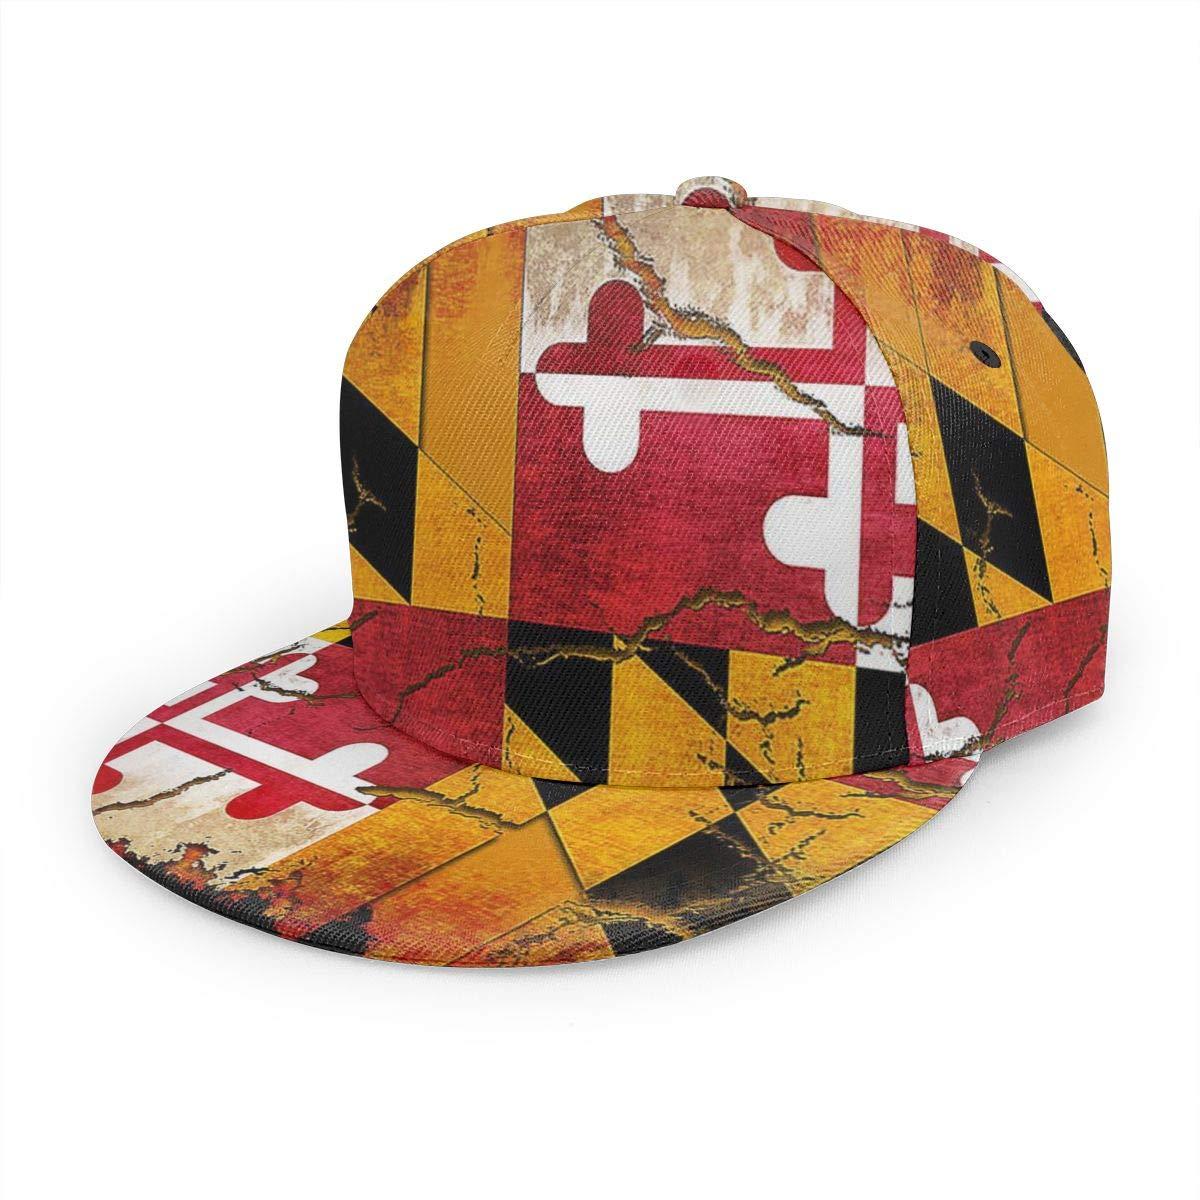 Maryland Flag Crack Grunge2222 Women Classic Hip Hop Baseball Cap 100/% Cotton Unisex Soft Adjustable Size Black